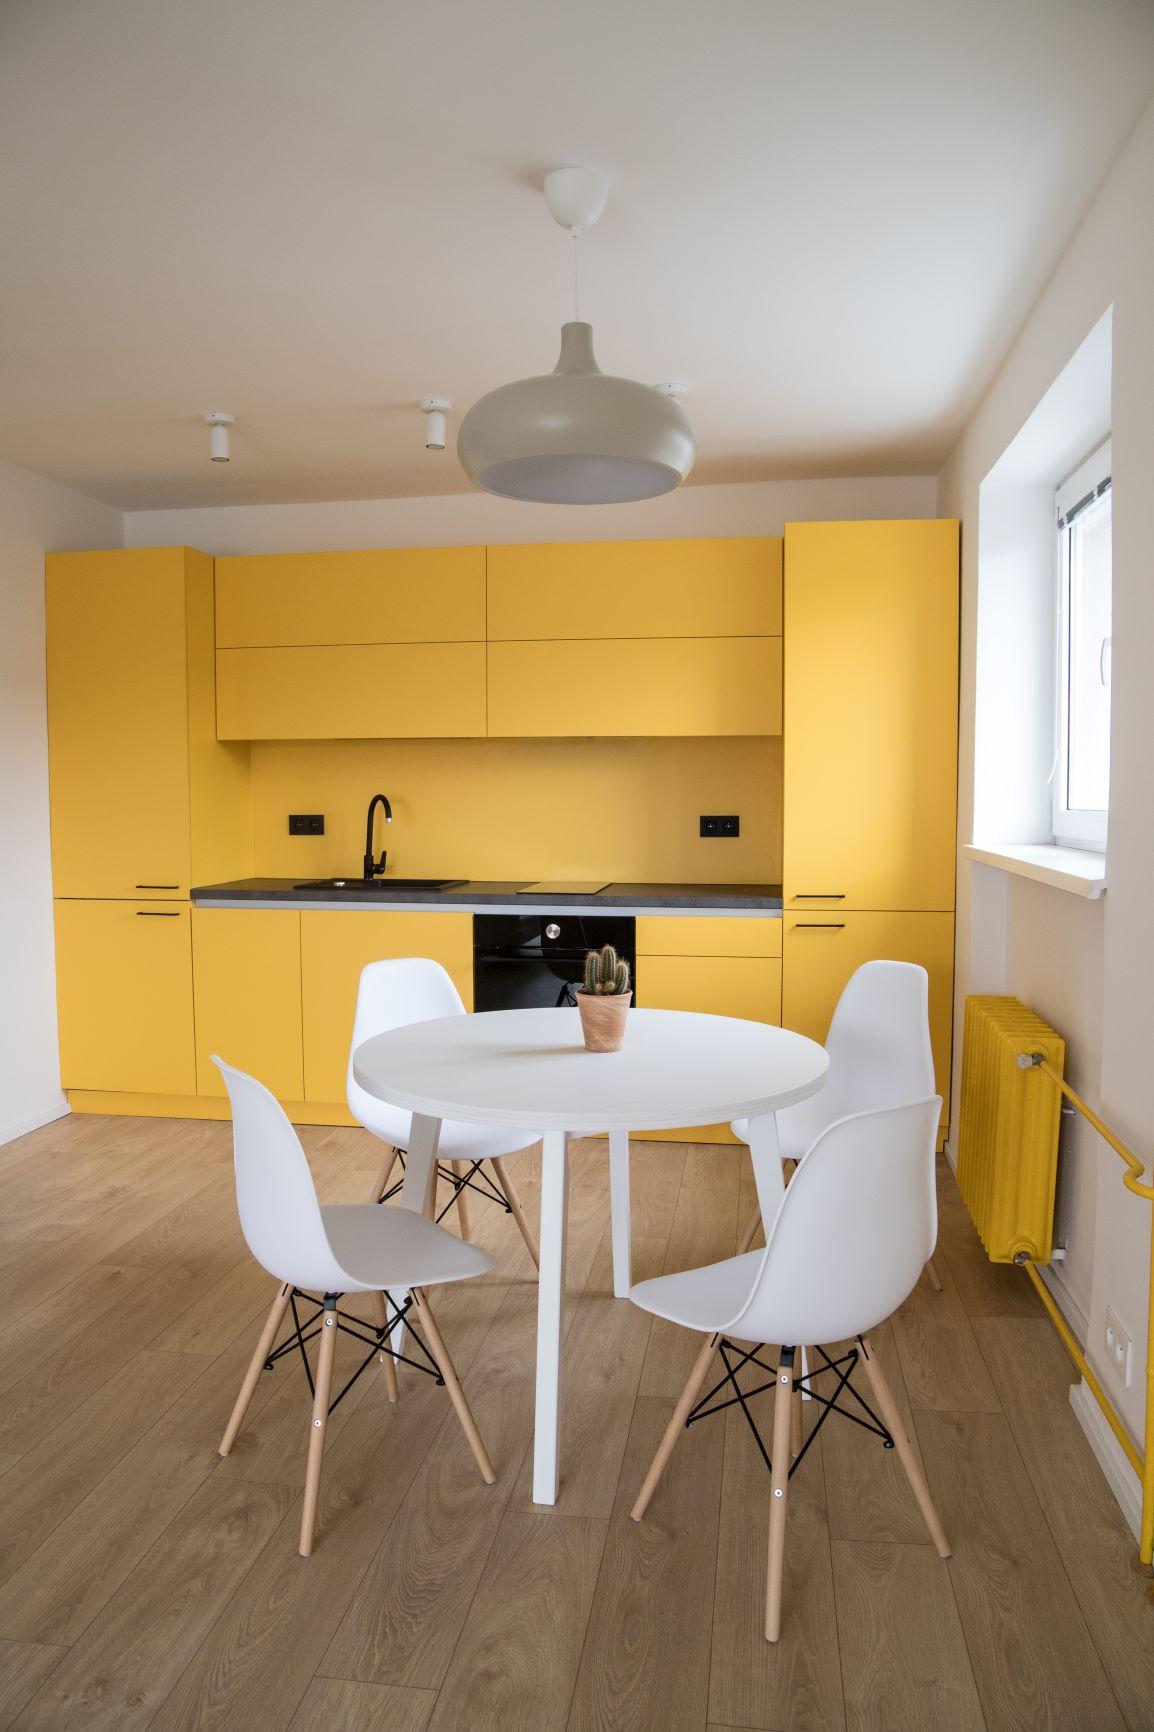 Žltá kuchyňa s bielym stolom